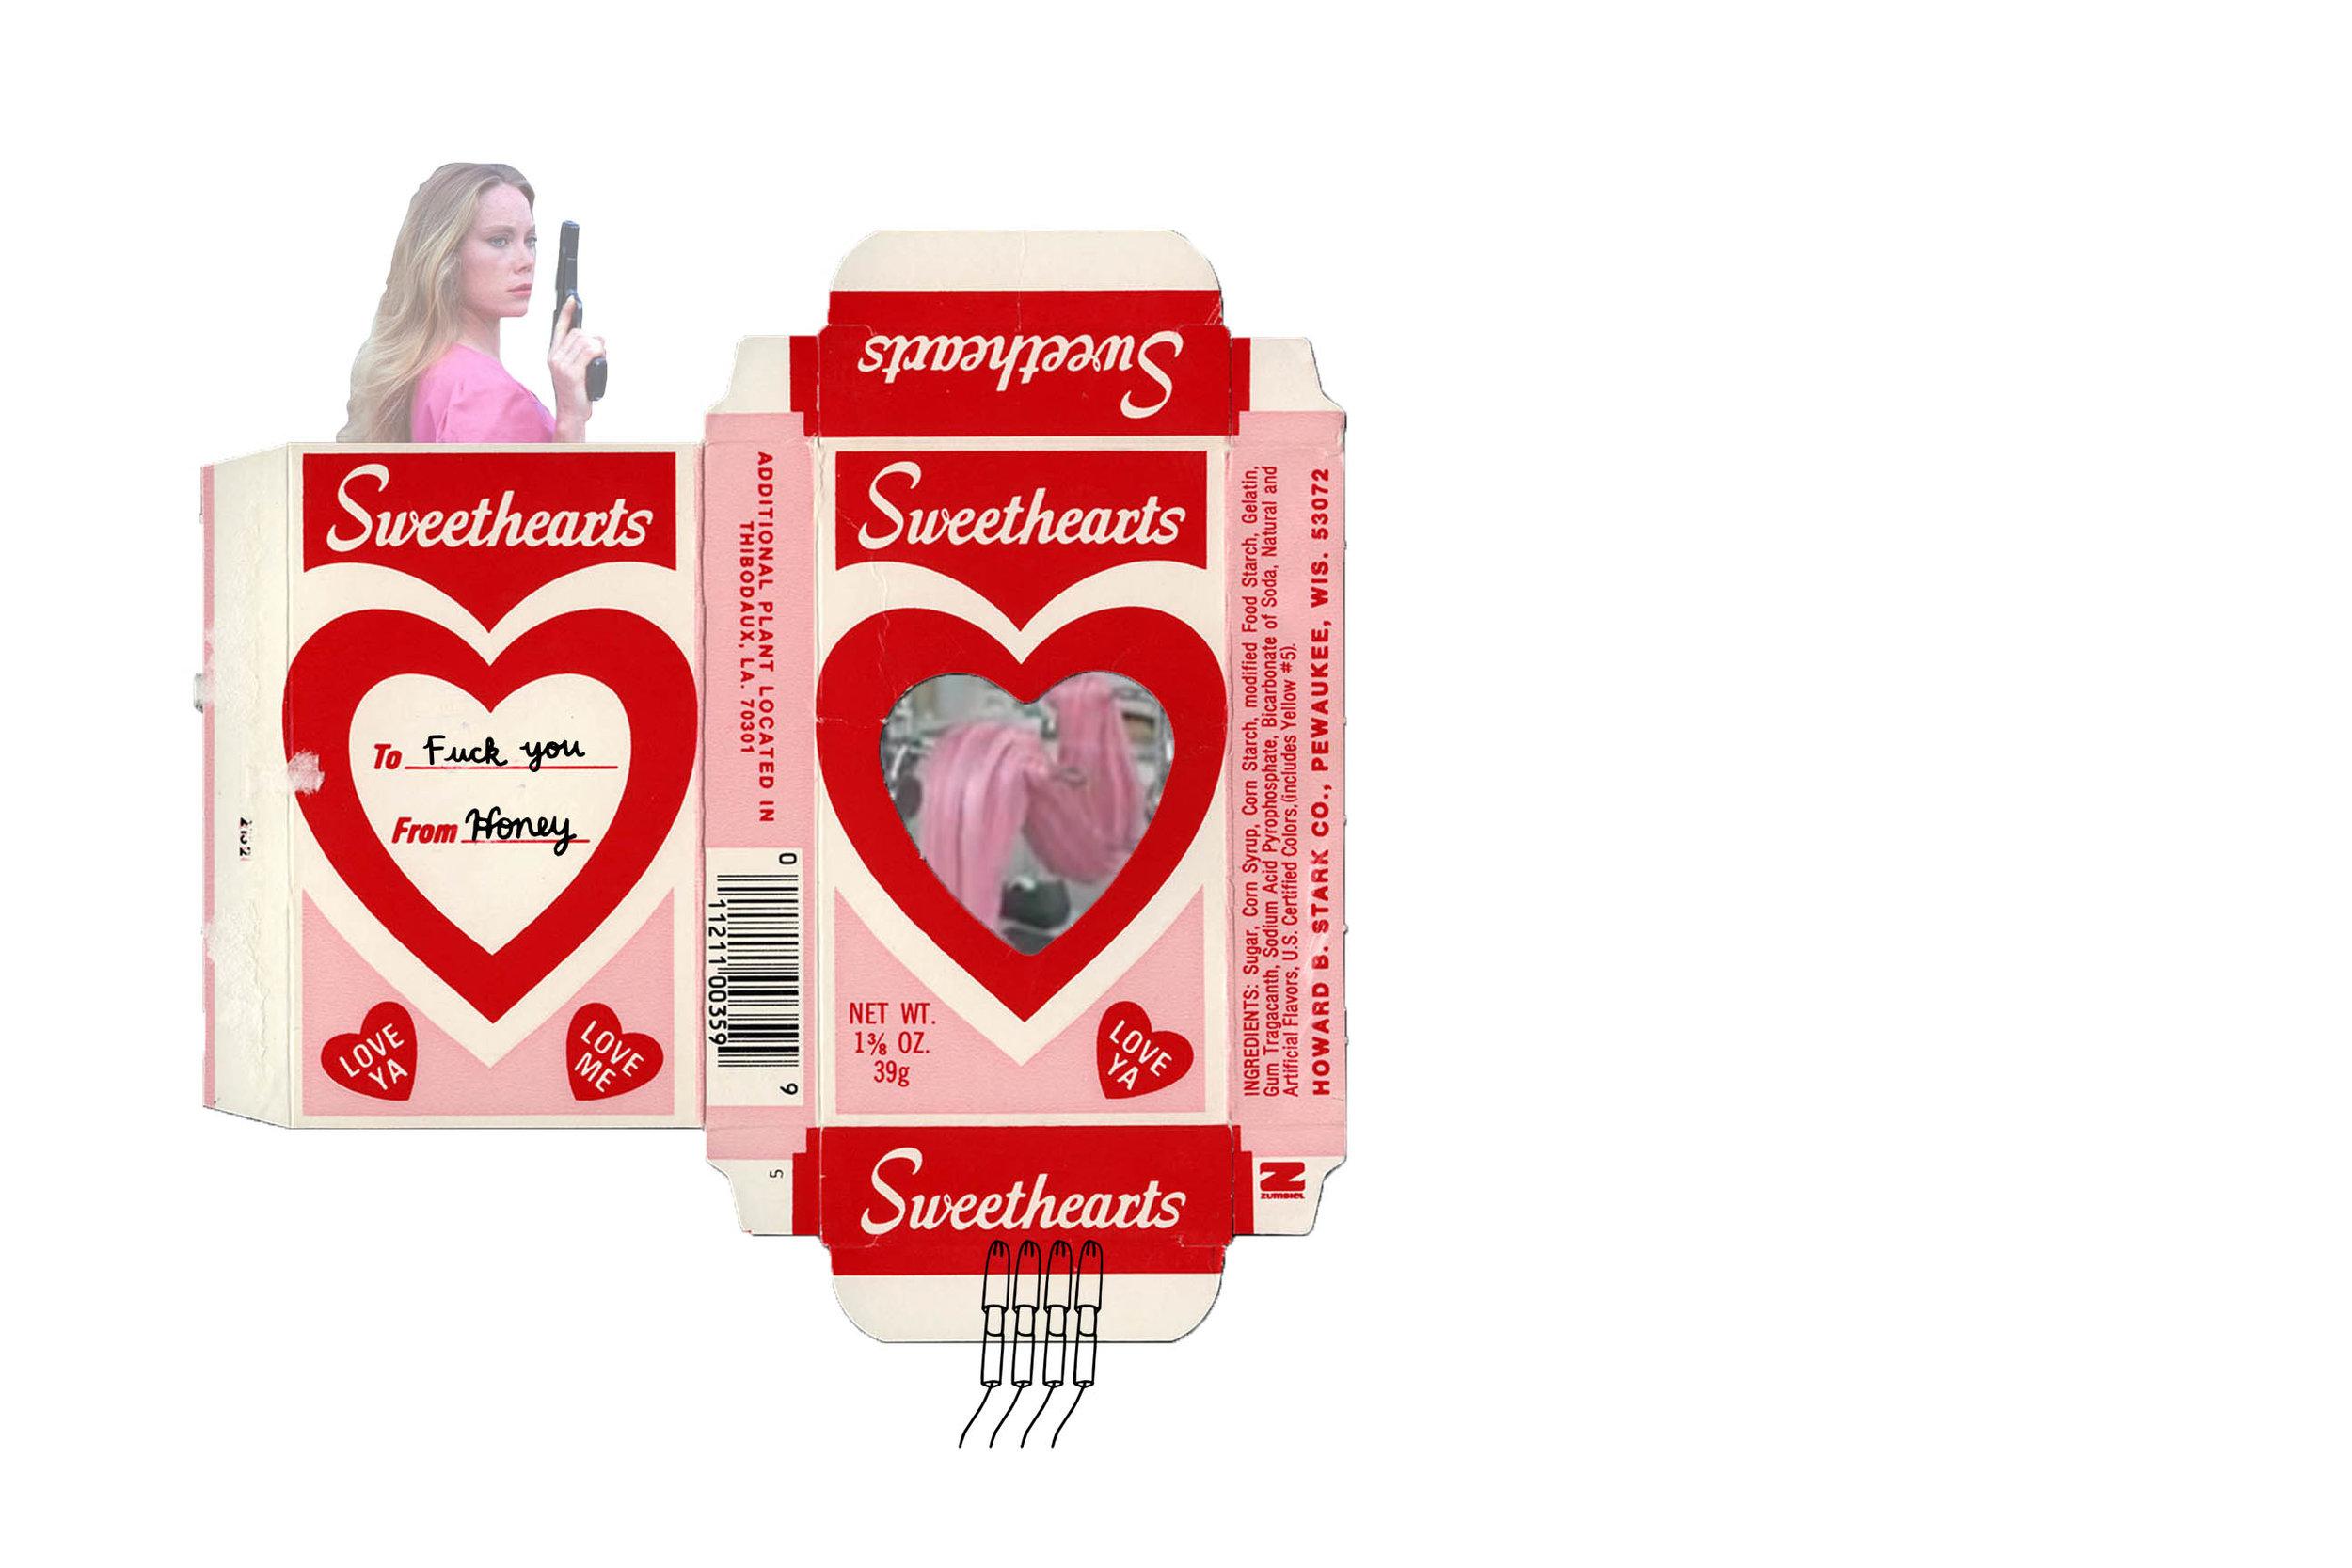 Sweethearts.jpg